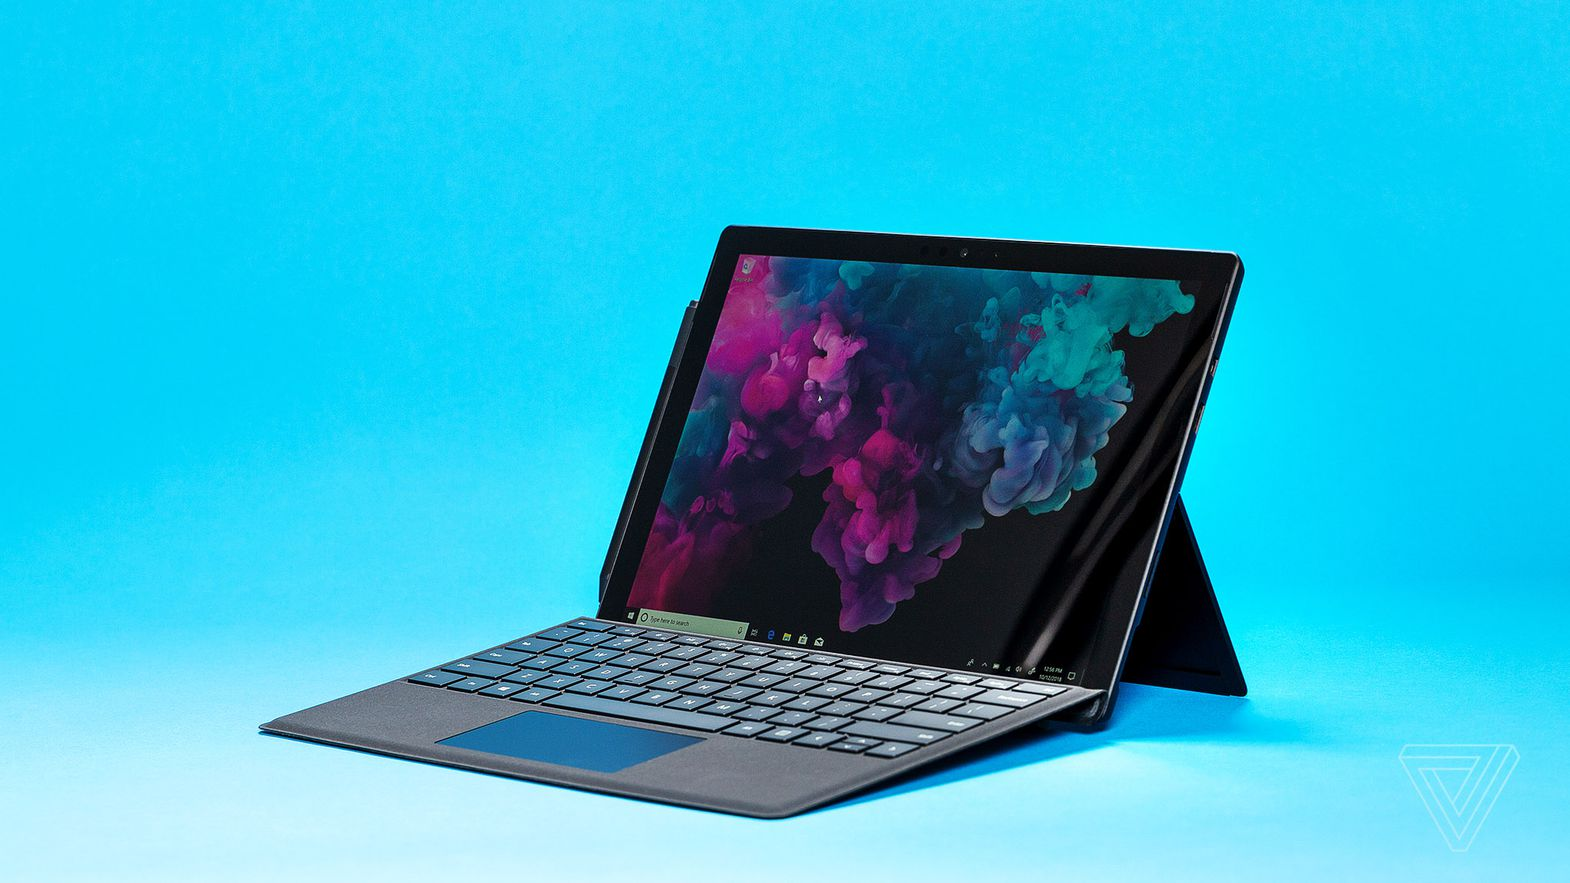 Surface Dock теперь поддерживает Surface Pro 6 и Surface